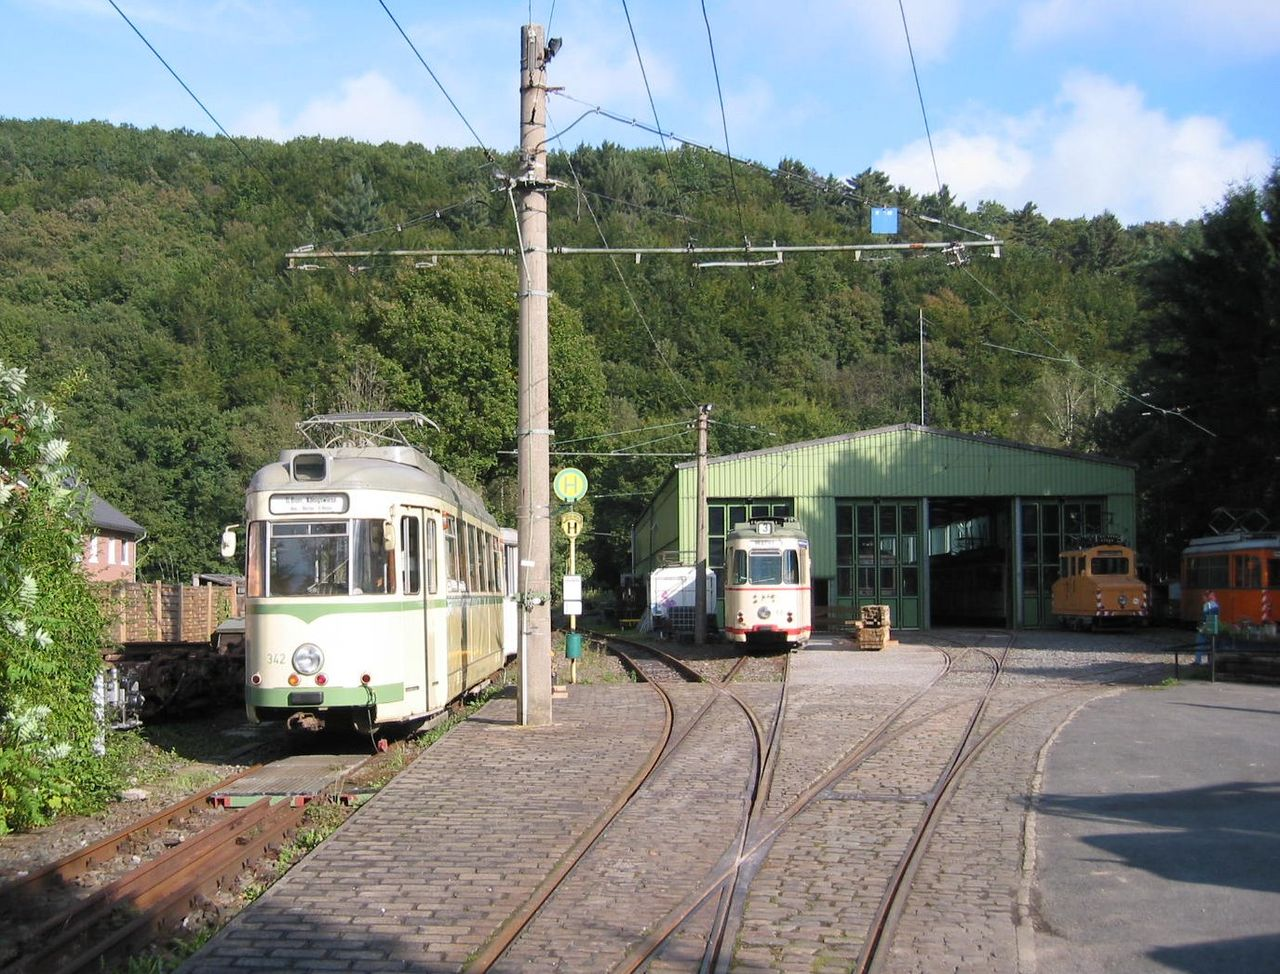 Bild Bergisches Straßenbahnmuseum Wuppertal